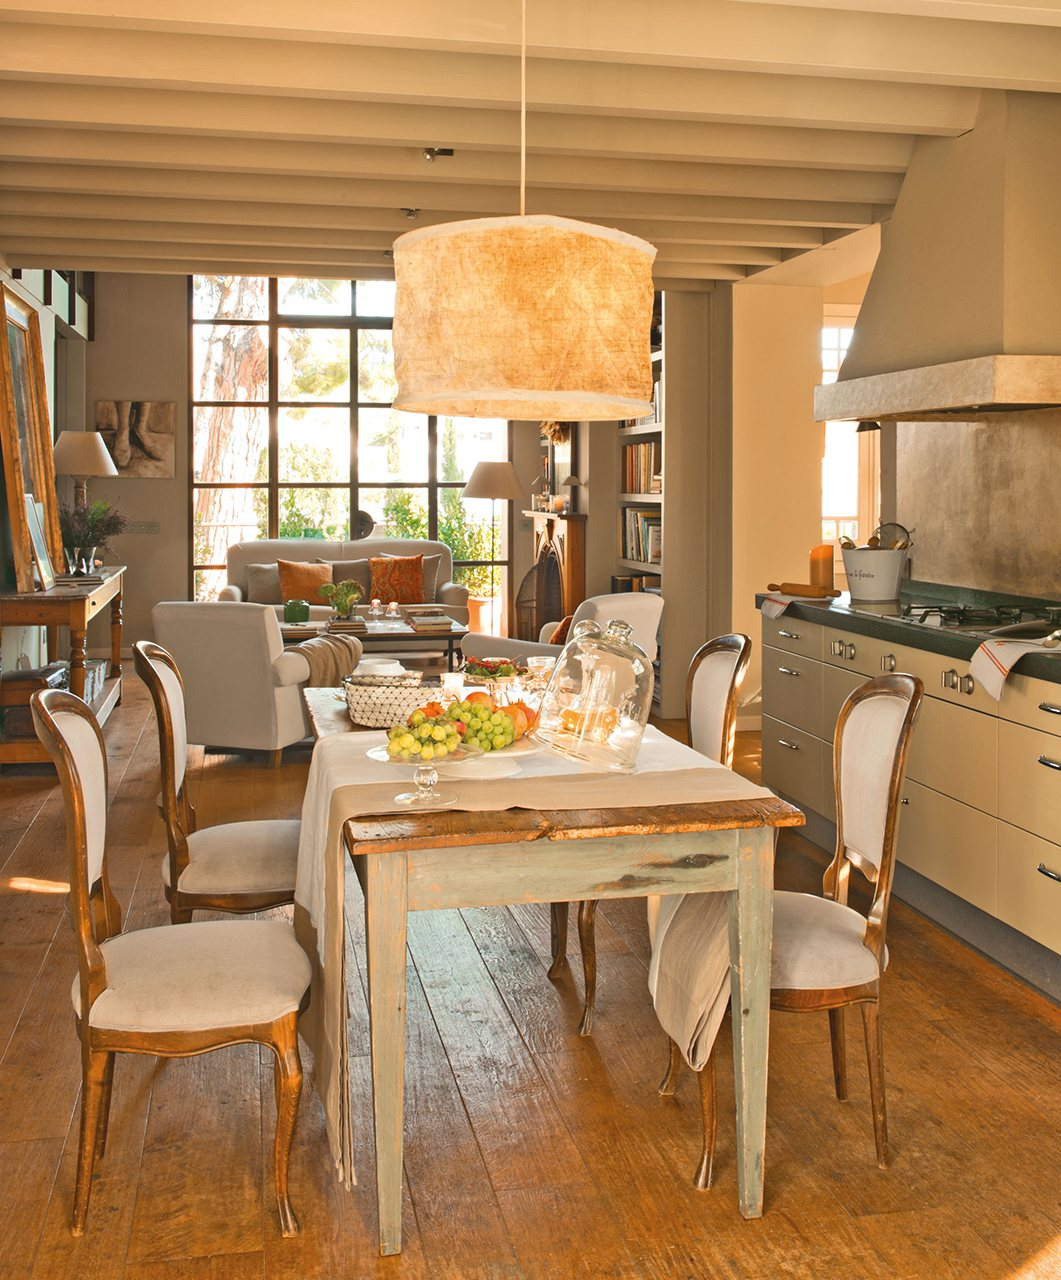 Ideas para ganar metros y ampliar visualmente pisos peque os for Modelos de cocina comedor pequenos